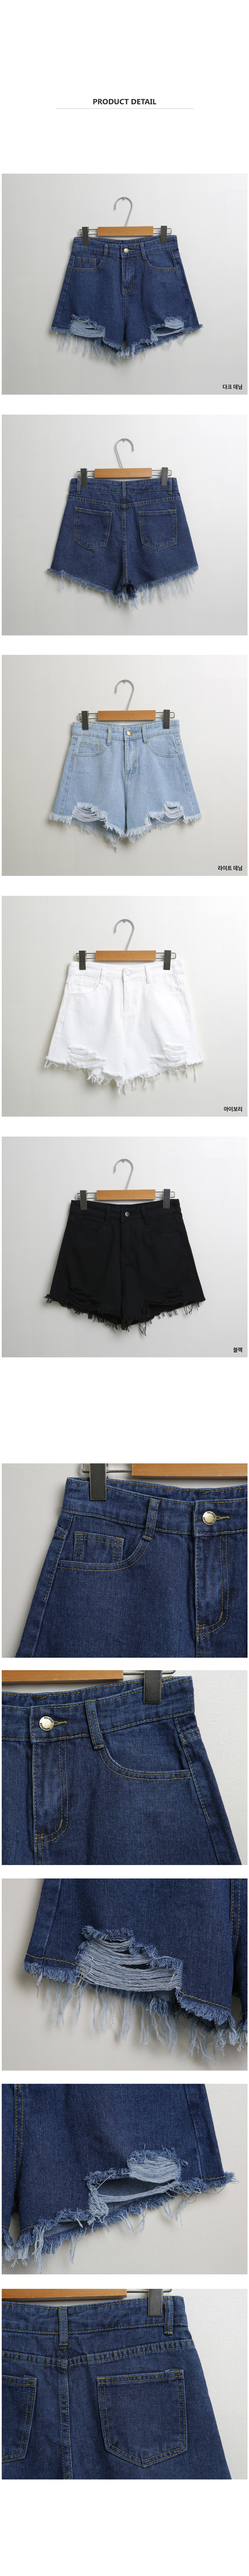 Surgical damage high shorts P#YW501